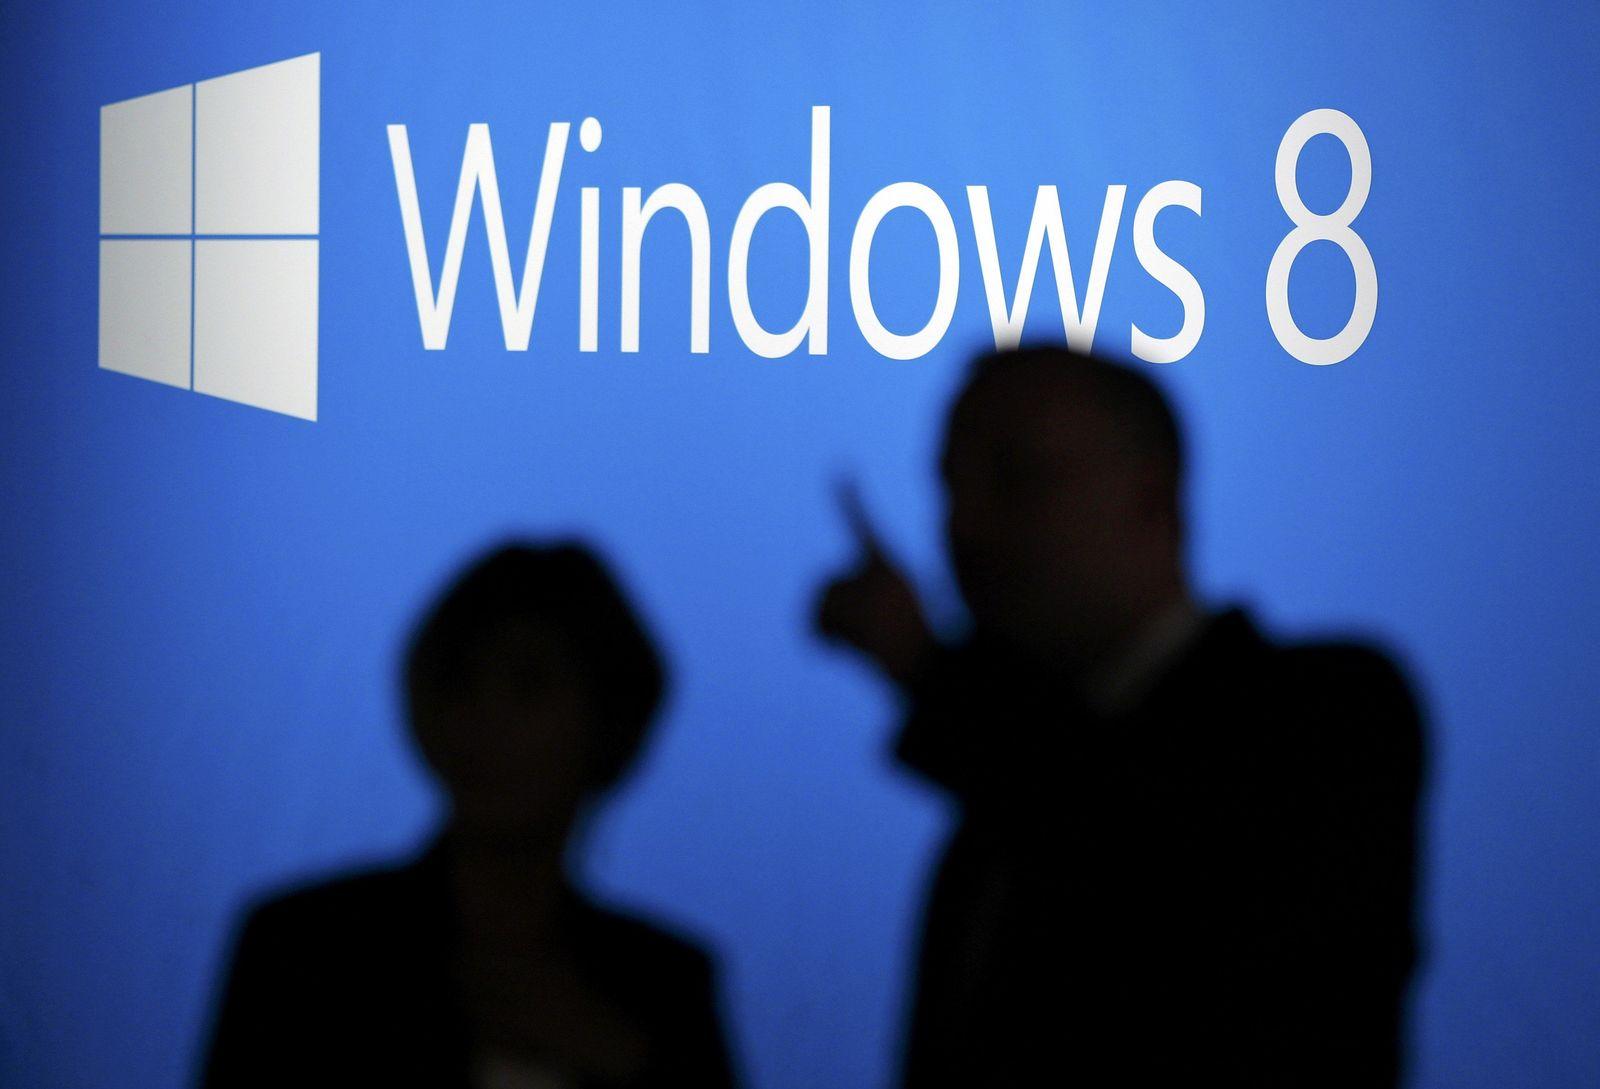 Windows 8 Präsentation